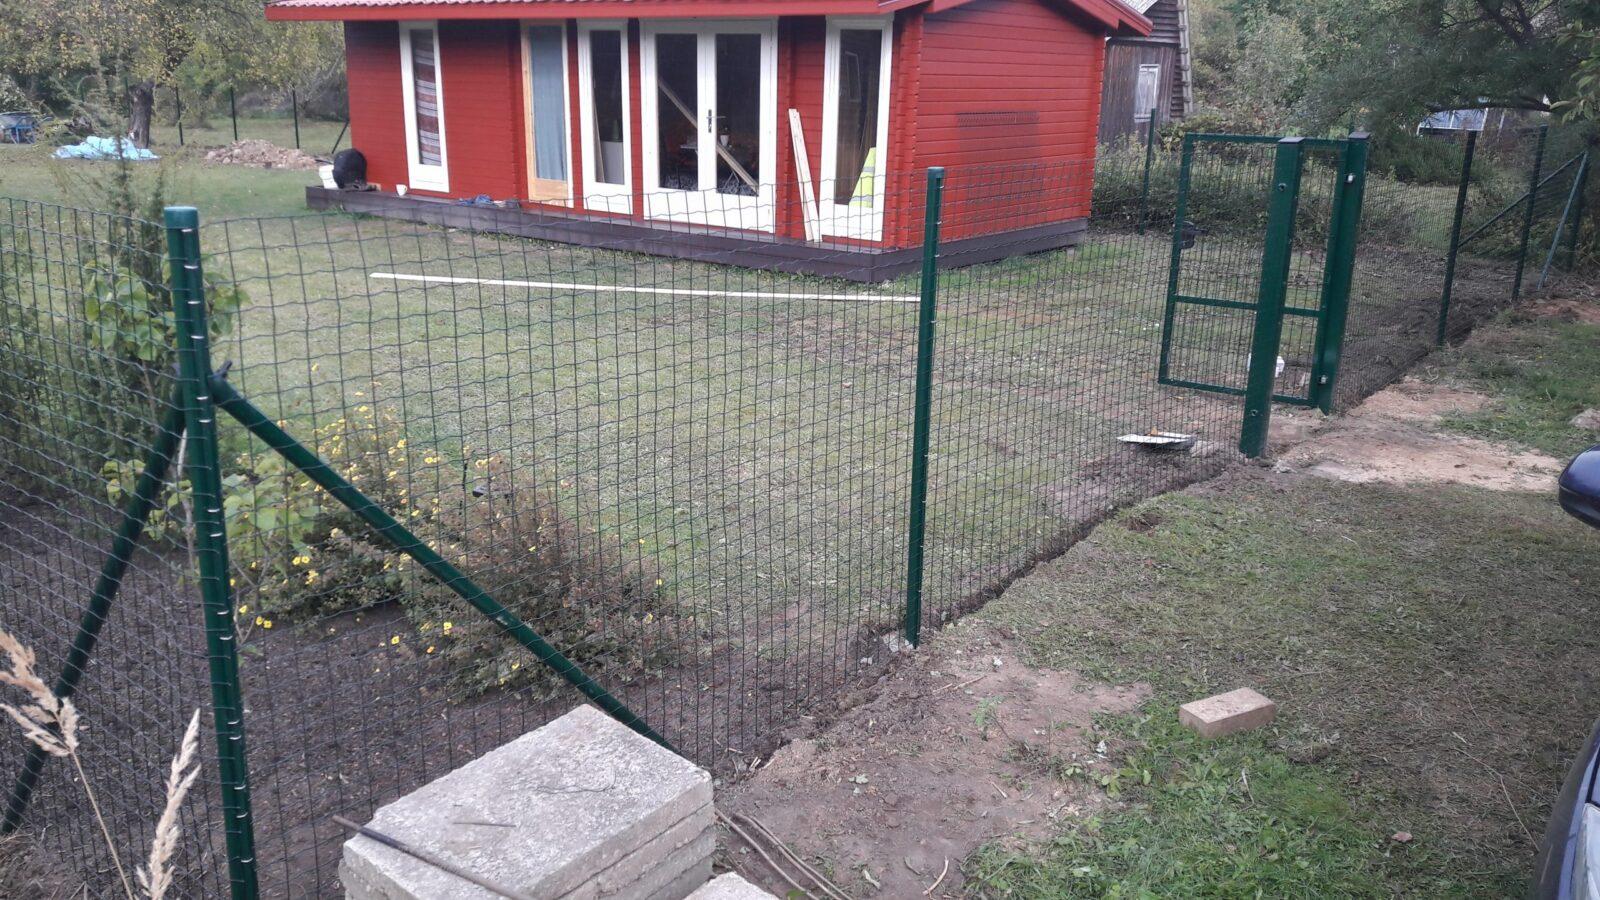 https://zogs.lv/wp-content/uploads/2016/10/Metinātie-ruļļu-žogi-10-scaled.jpg